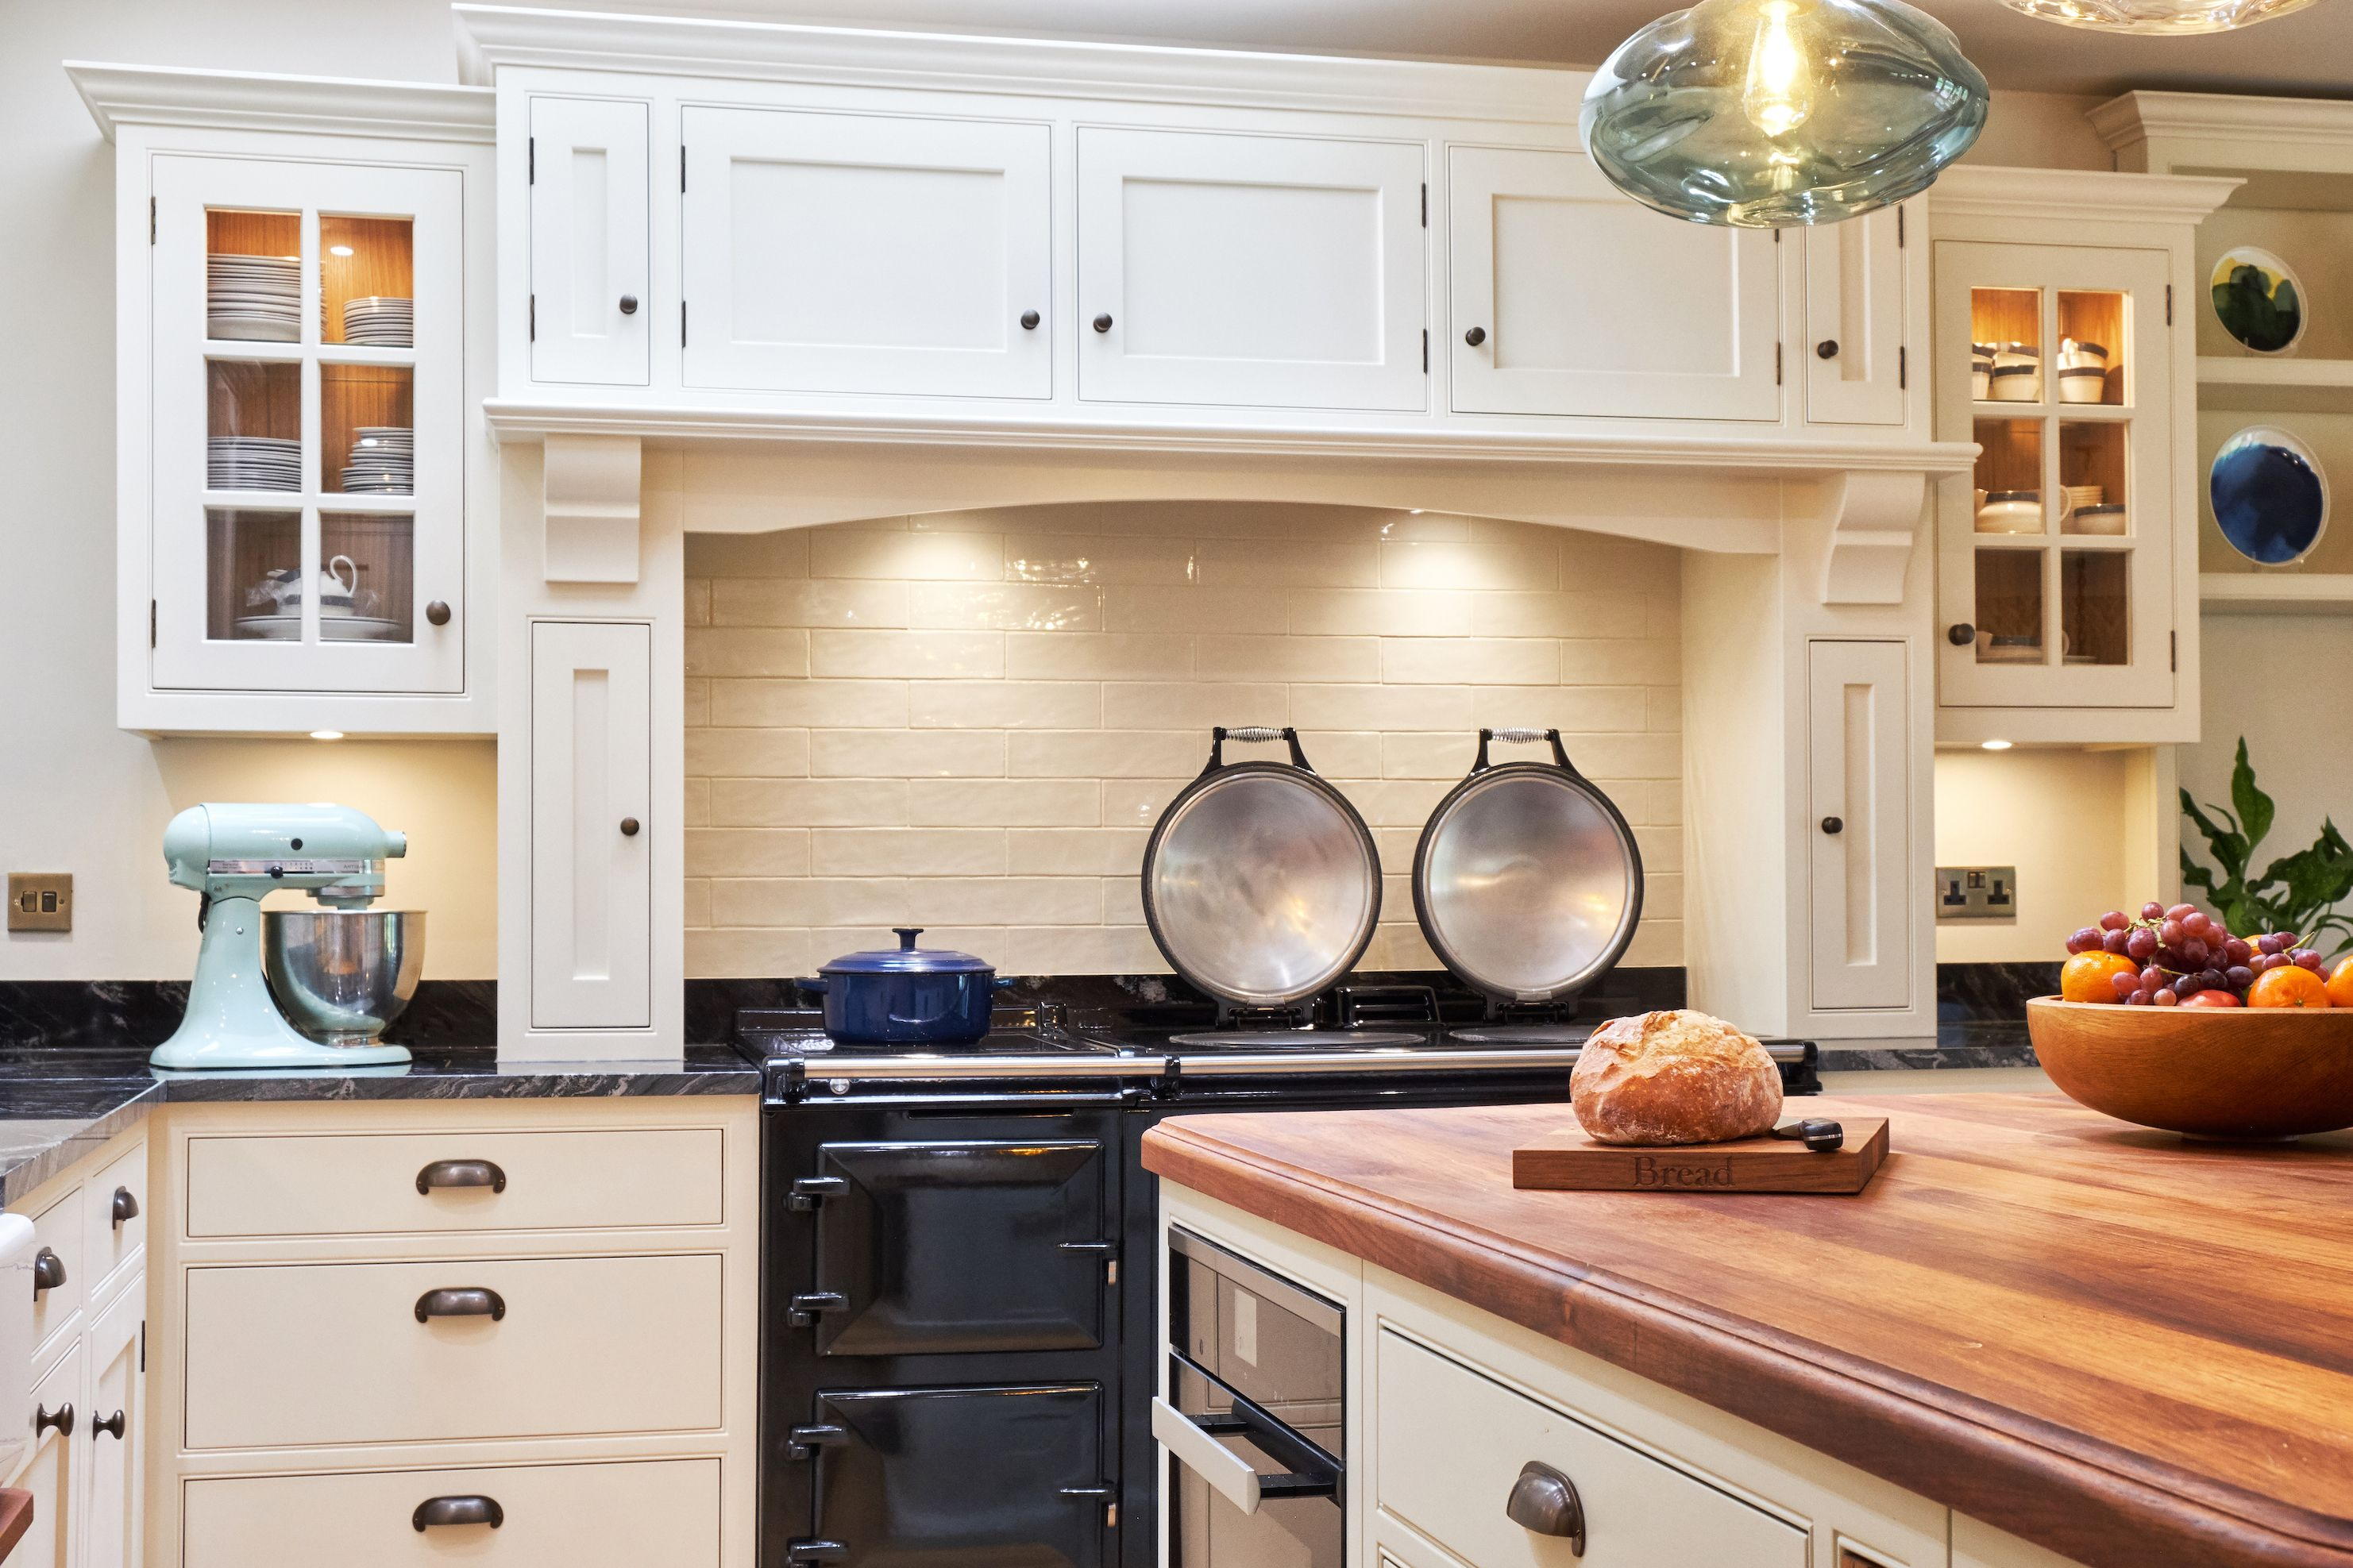 Bespoke Kitchen Farrow Ball Clunch Aga Shaker Interior Design